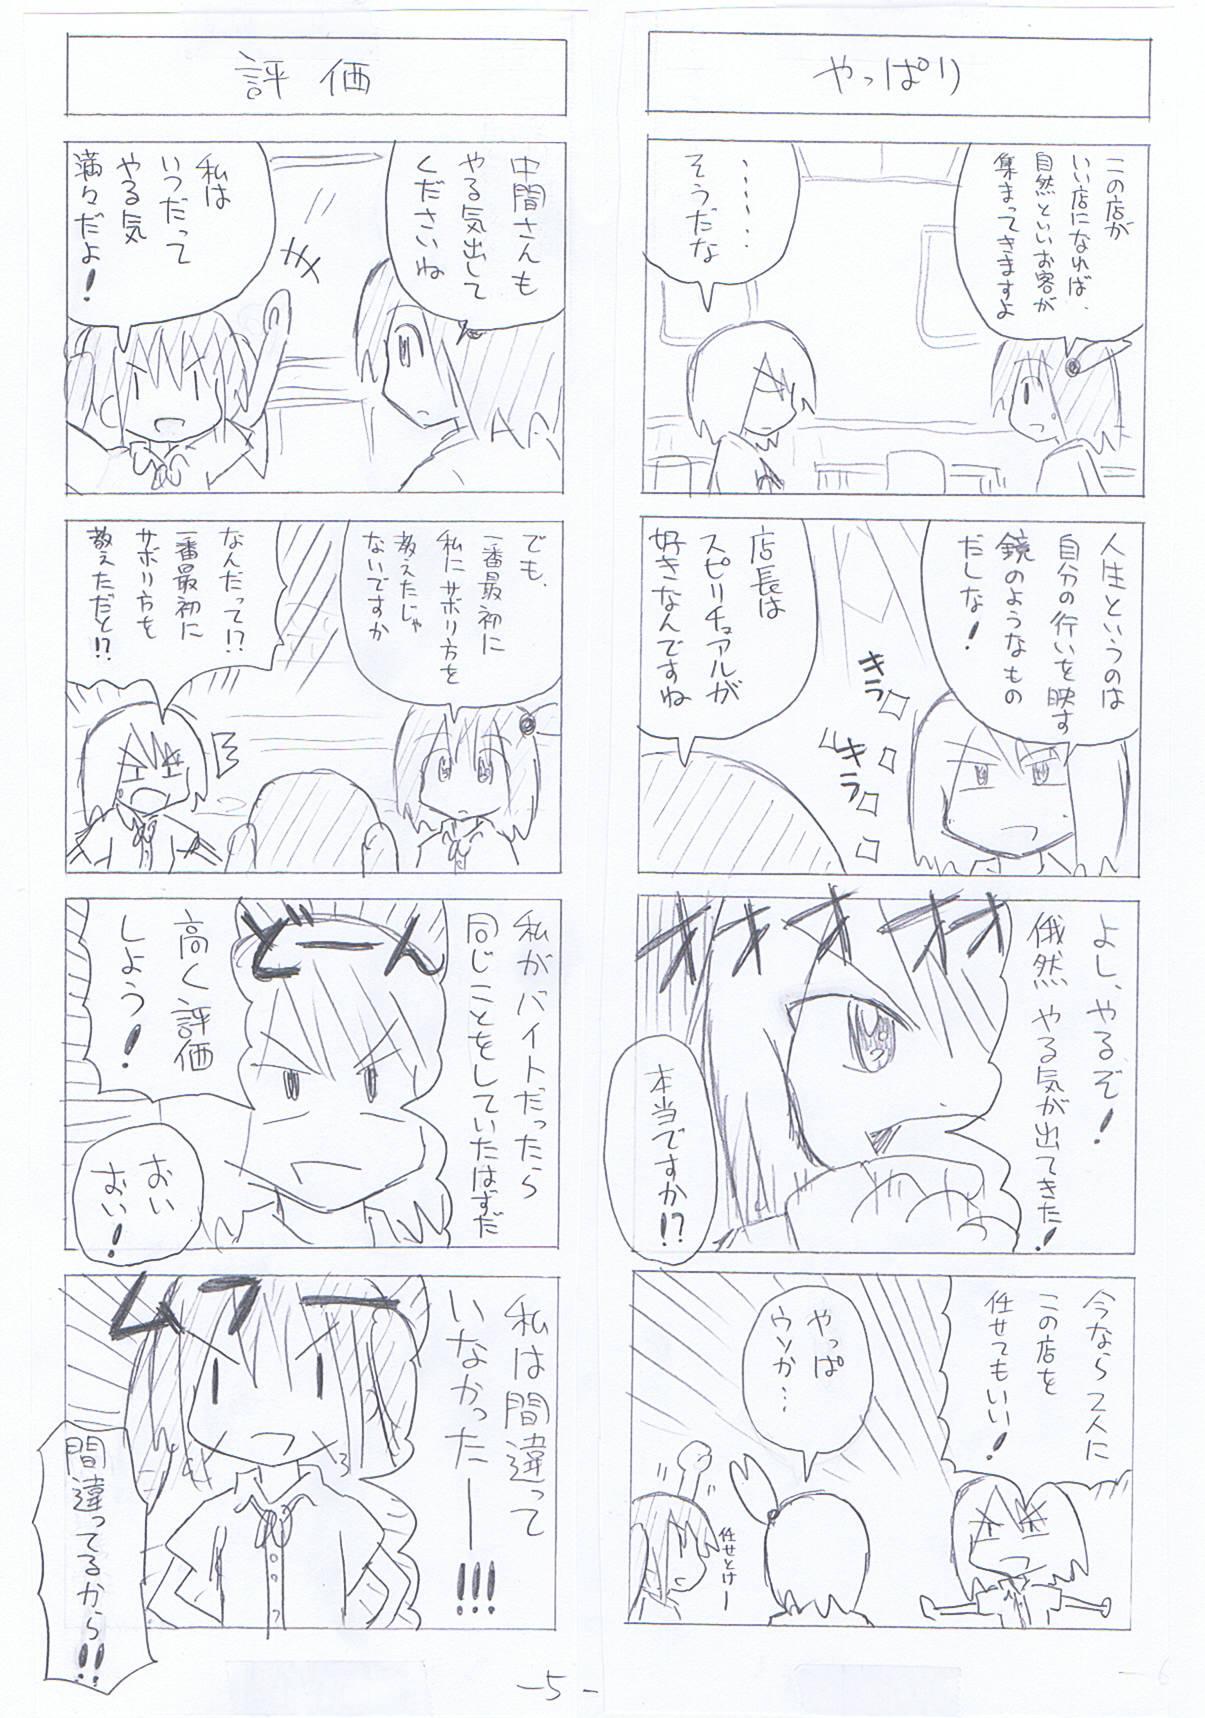 hitotoki-2-5.jpg